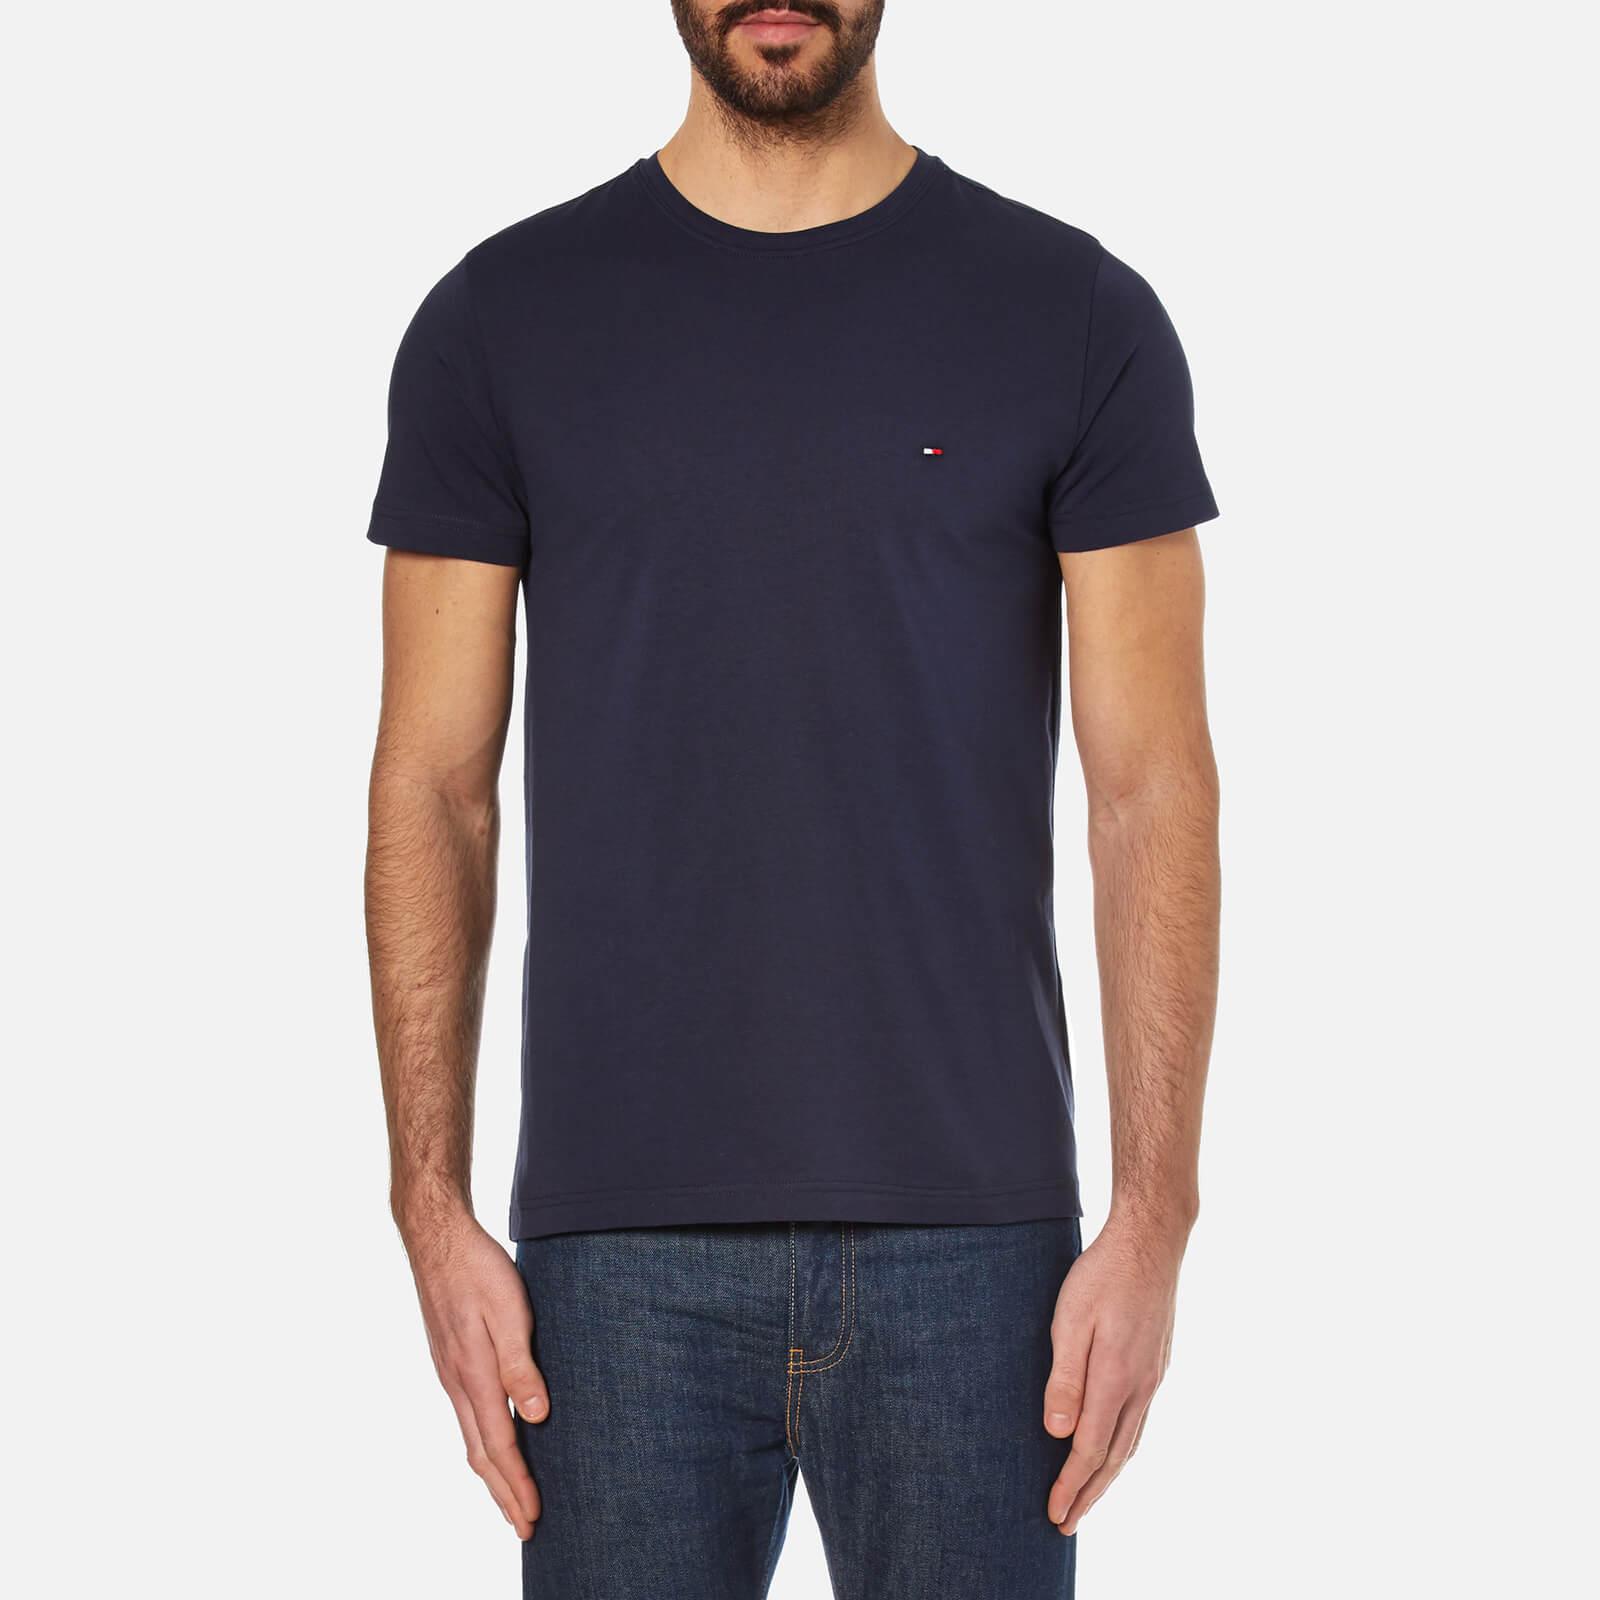 Tommy Hilfiger Navy New Stretch T Shirt